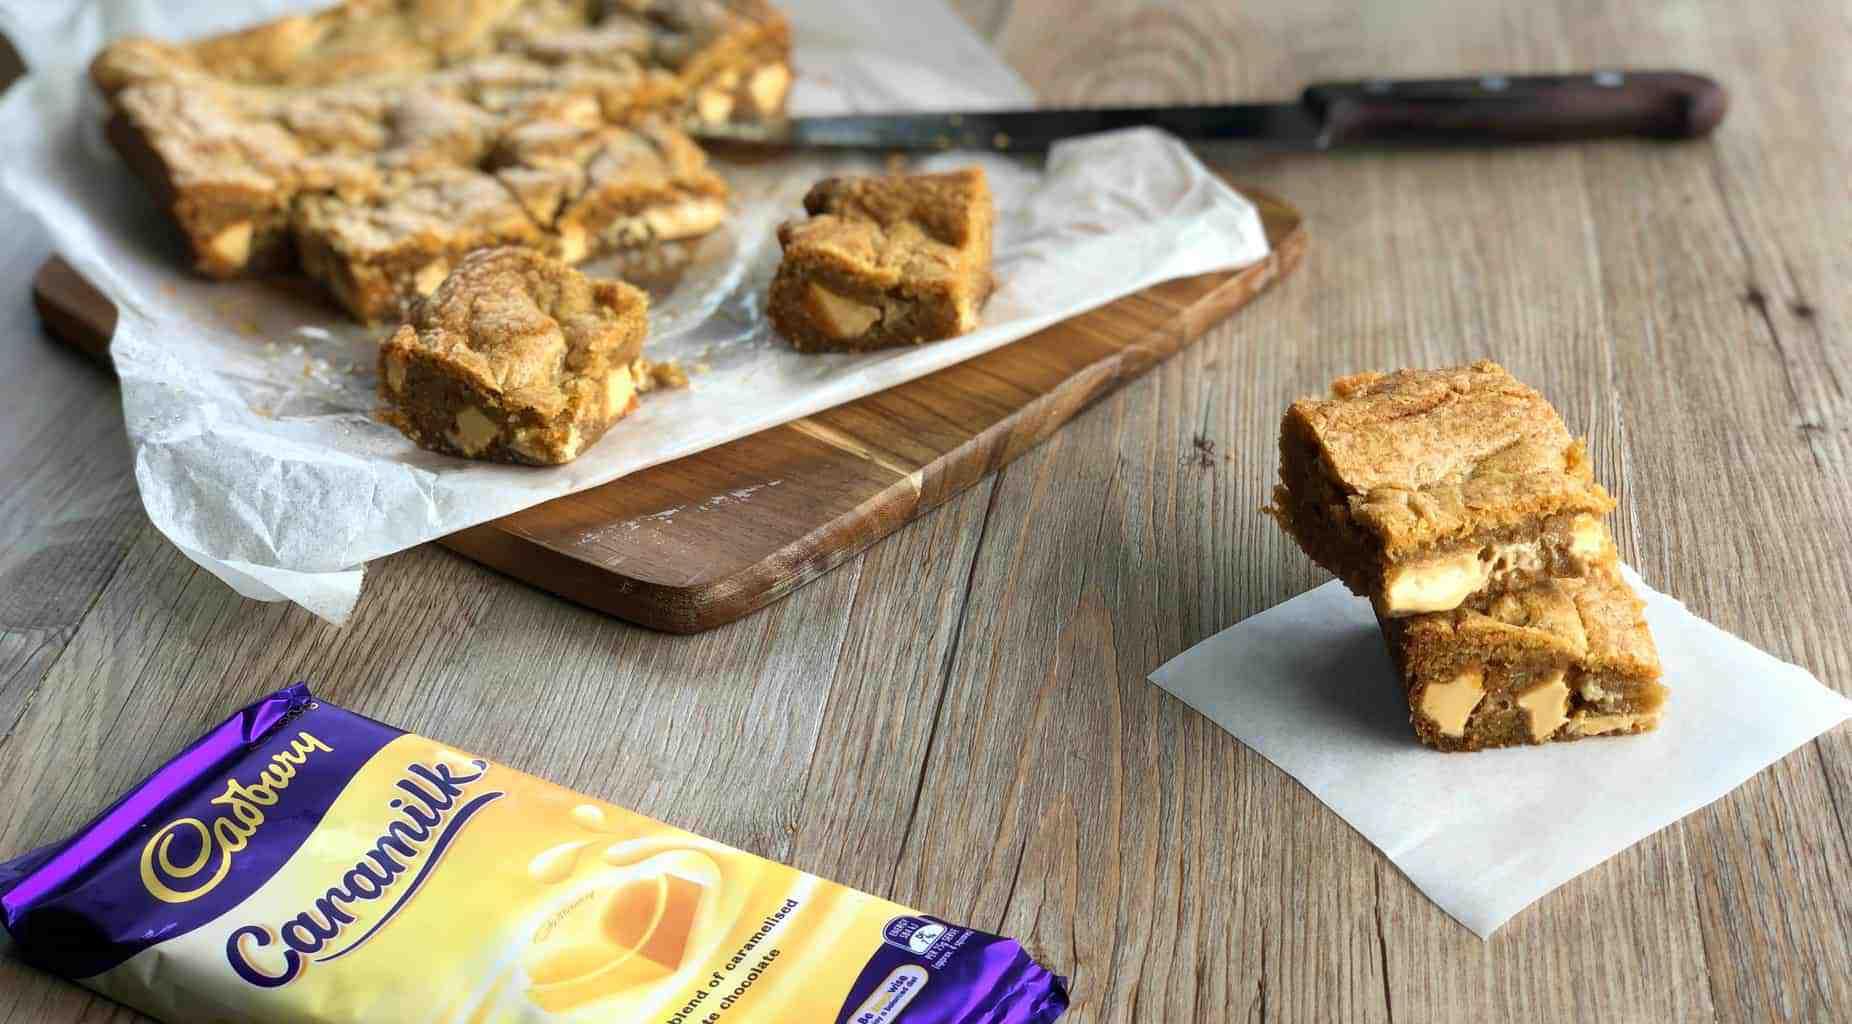 Caramilk Baking New Zealand and Australia